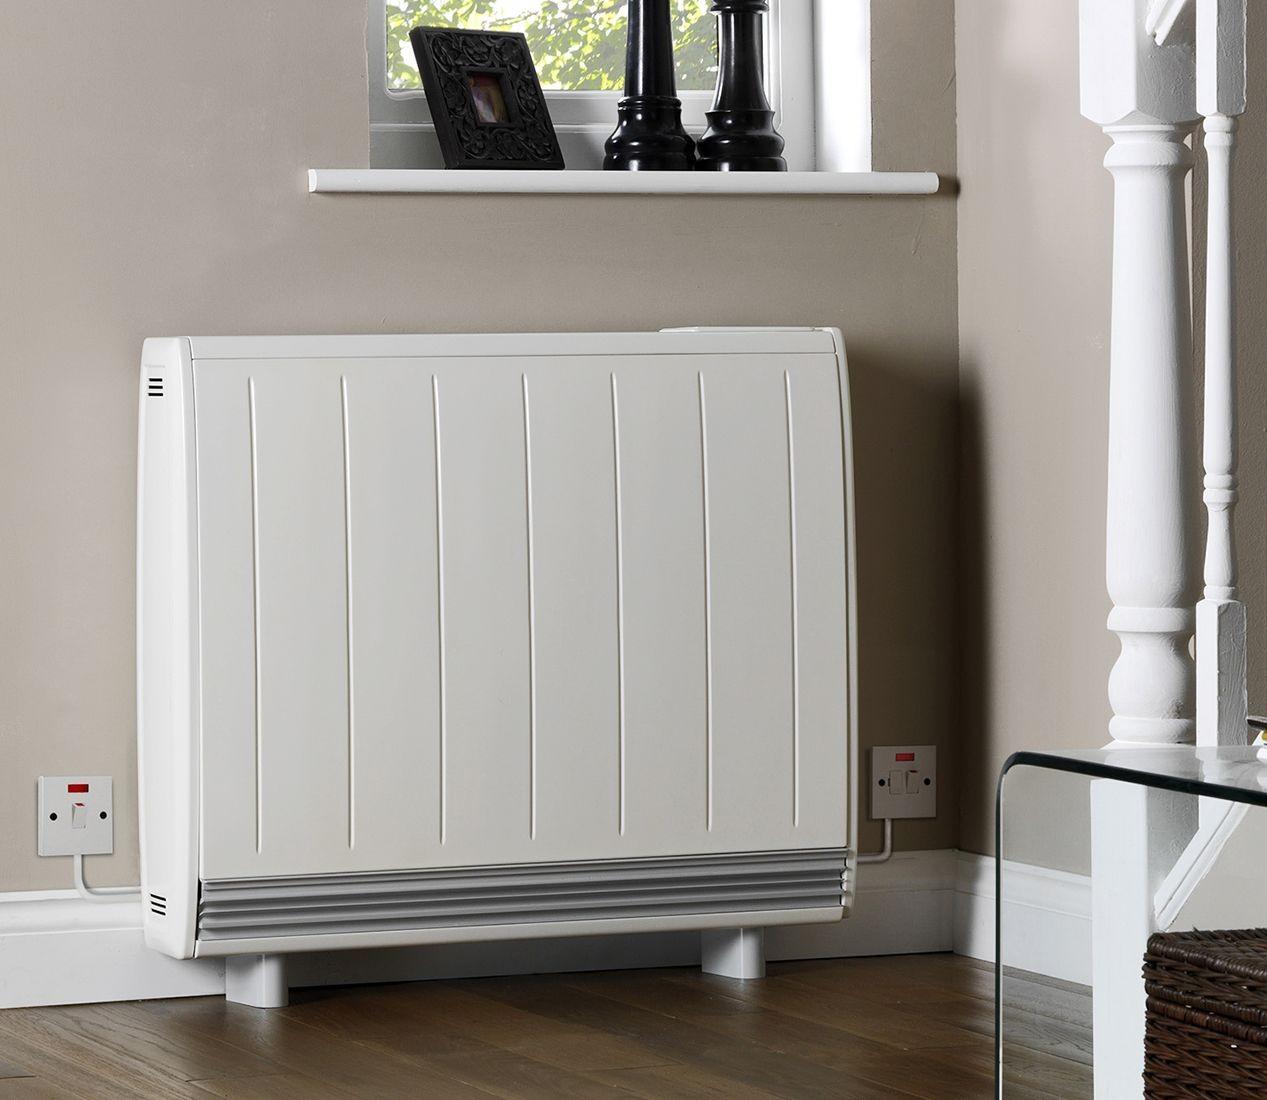 Dimplex Quantum 1250w Storage Heater Qm125 with dimensions 1267 X 1100